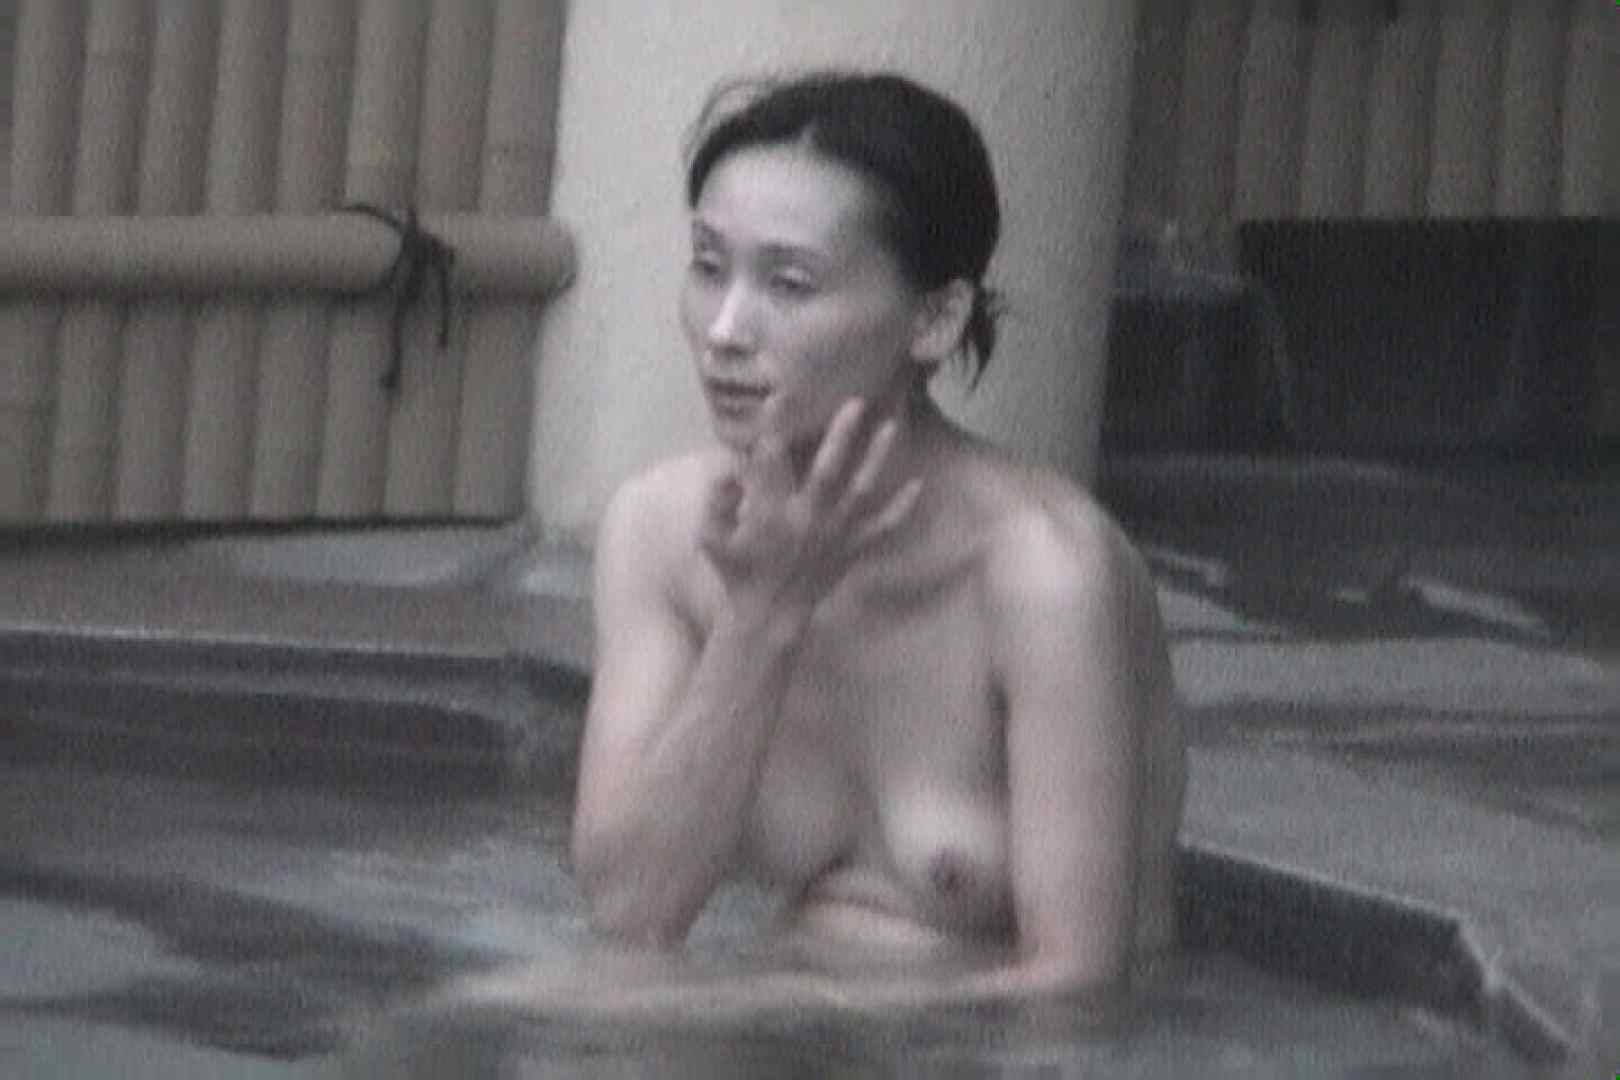 Aquaな露天風呂Vol.557 露天風呂編 | 盗撮シリーズ  100PIX 95